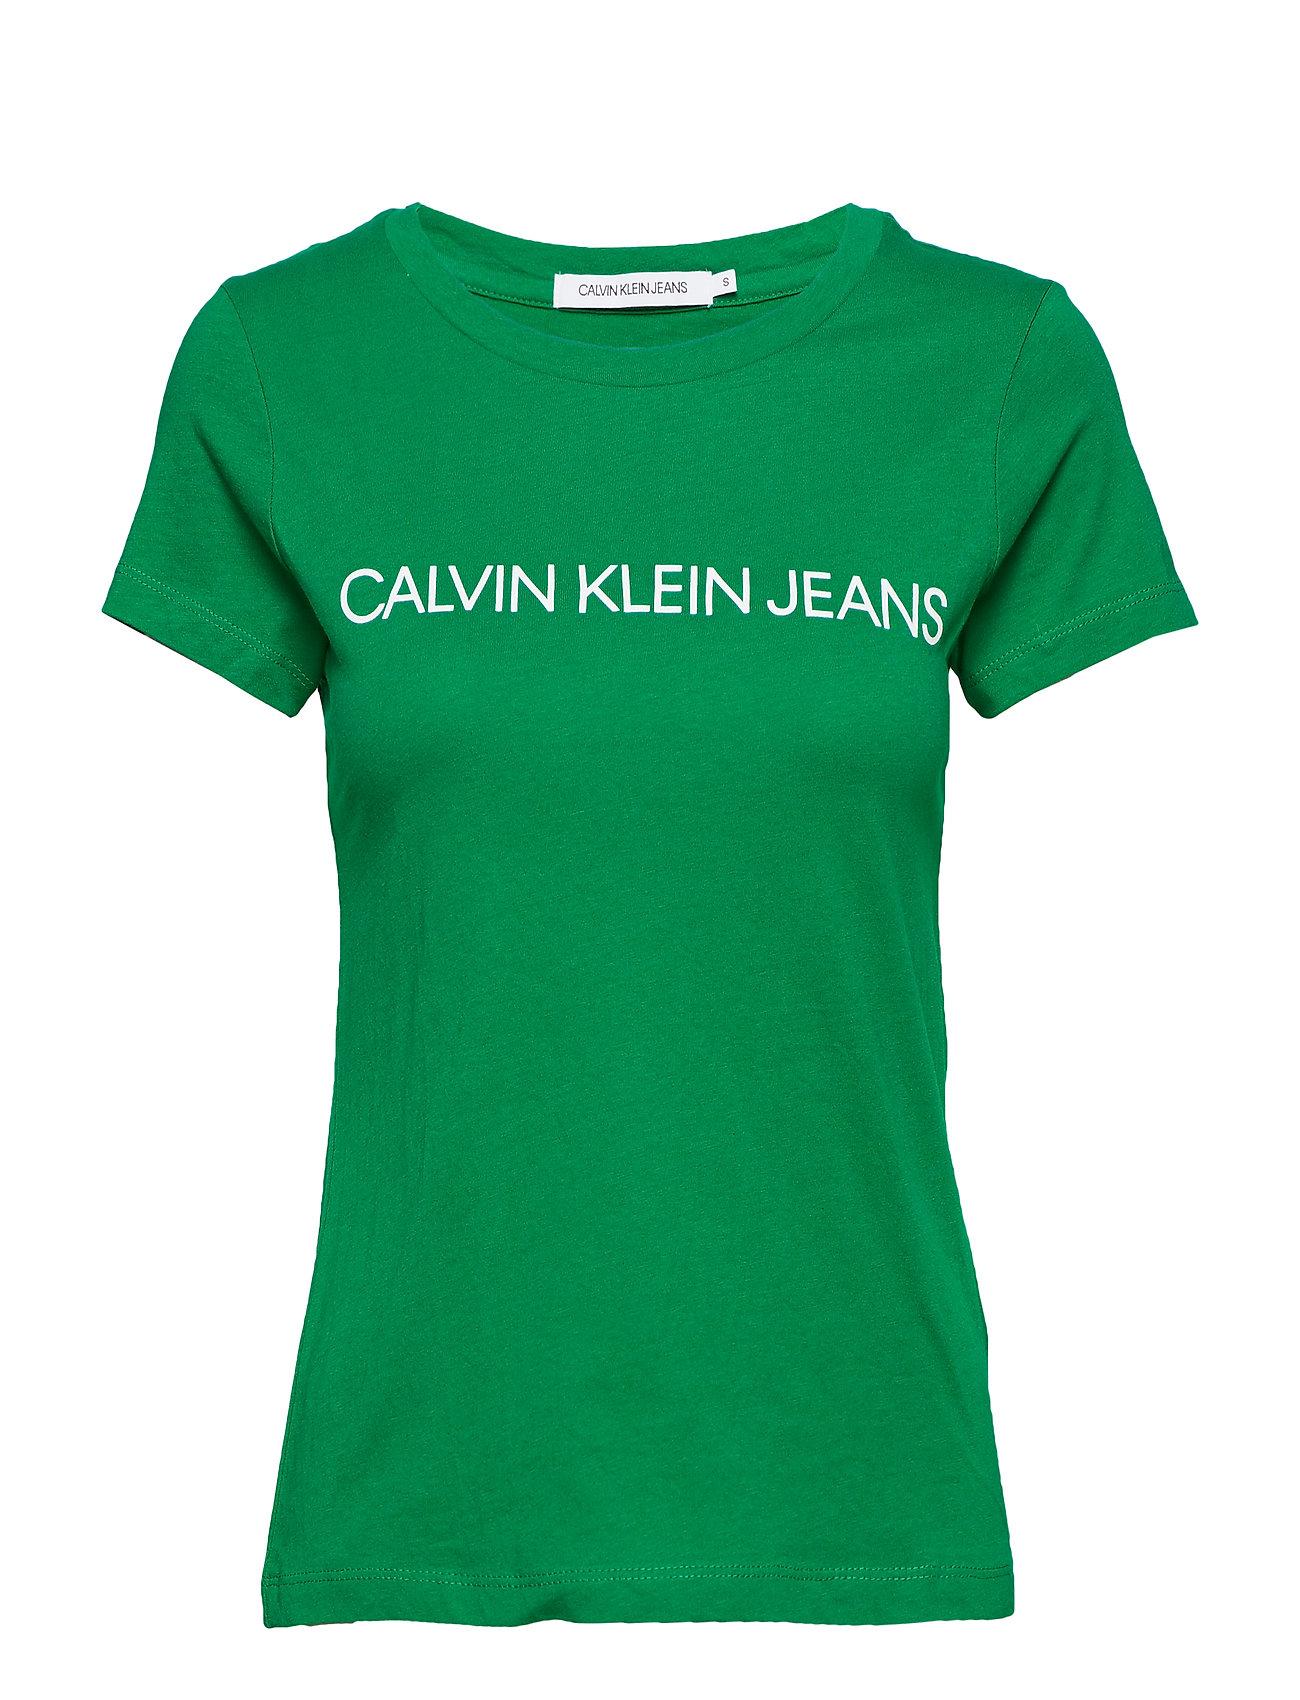 Calvin Klein Jeans INSTITUTIONAL LOGO SLIM FIT TEE